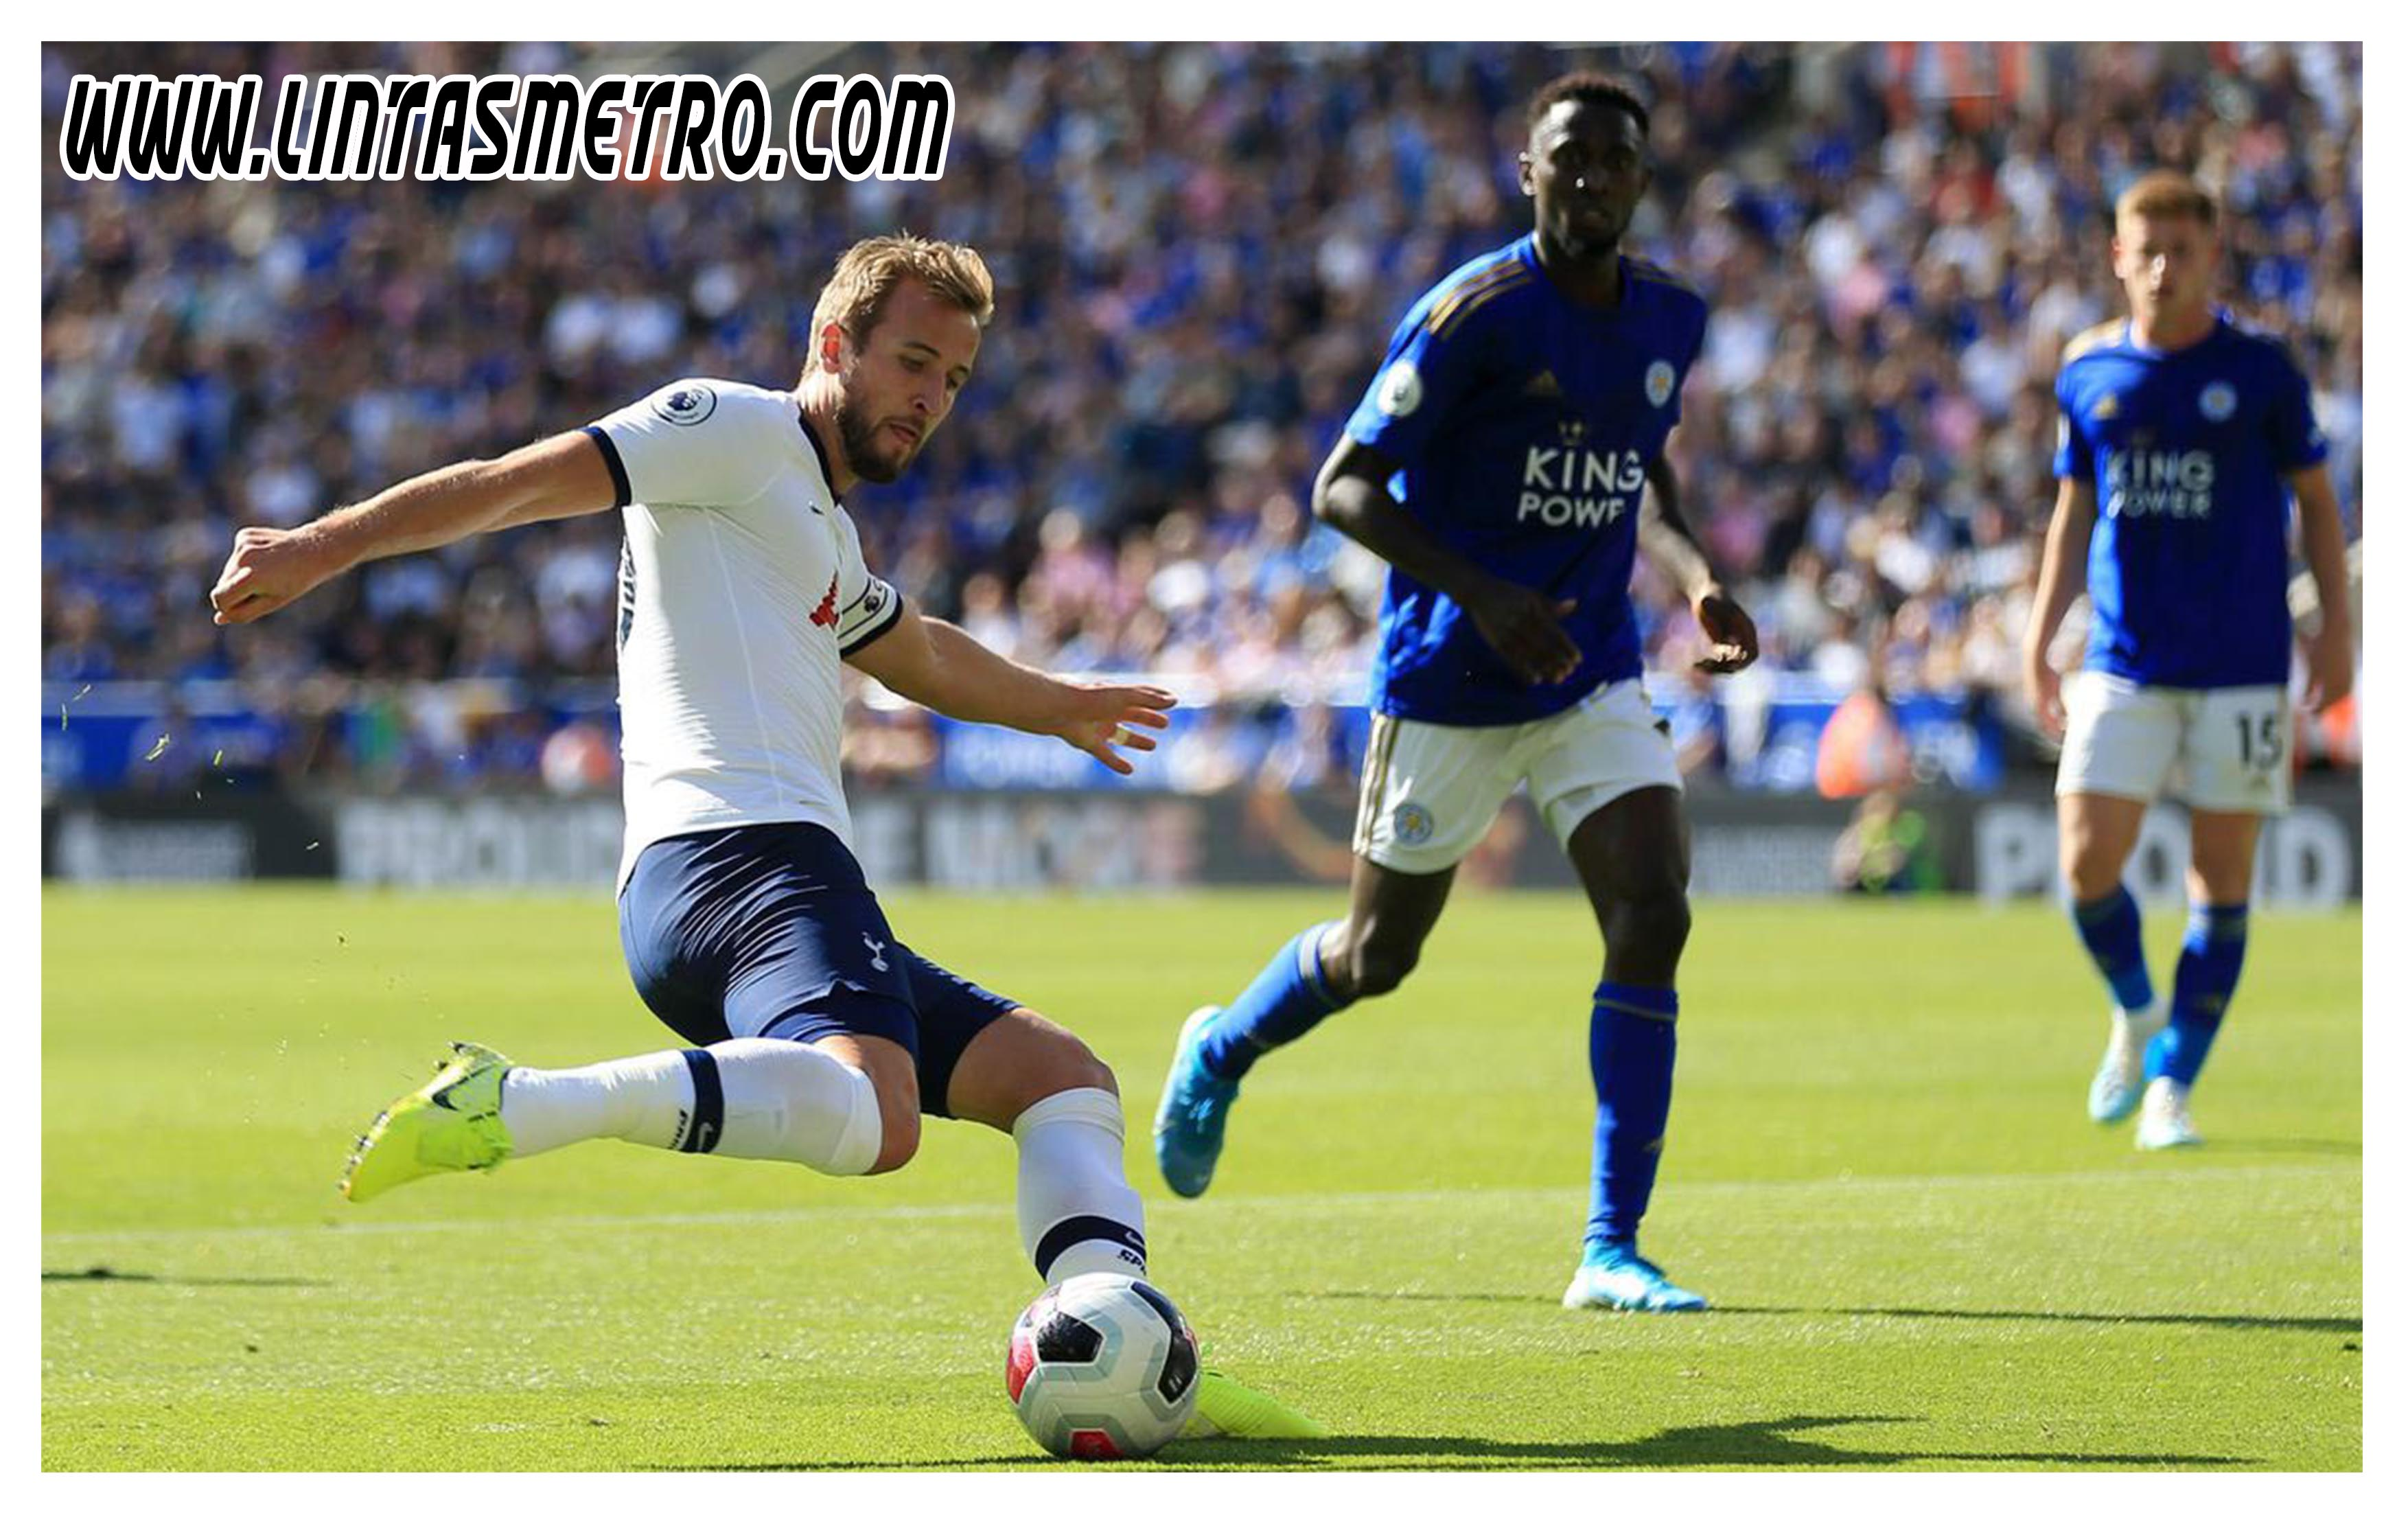 Tottenham Hotspur vs Leicester City Prediksi Liga Inggris 2020/21